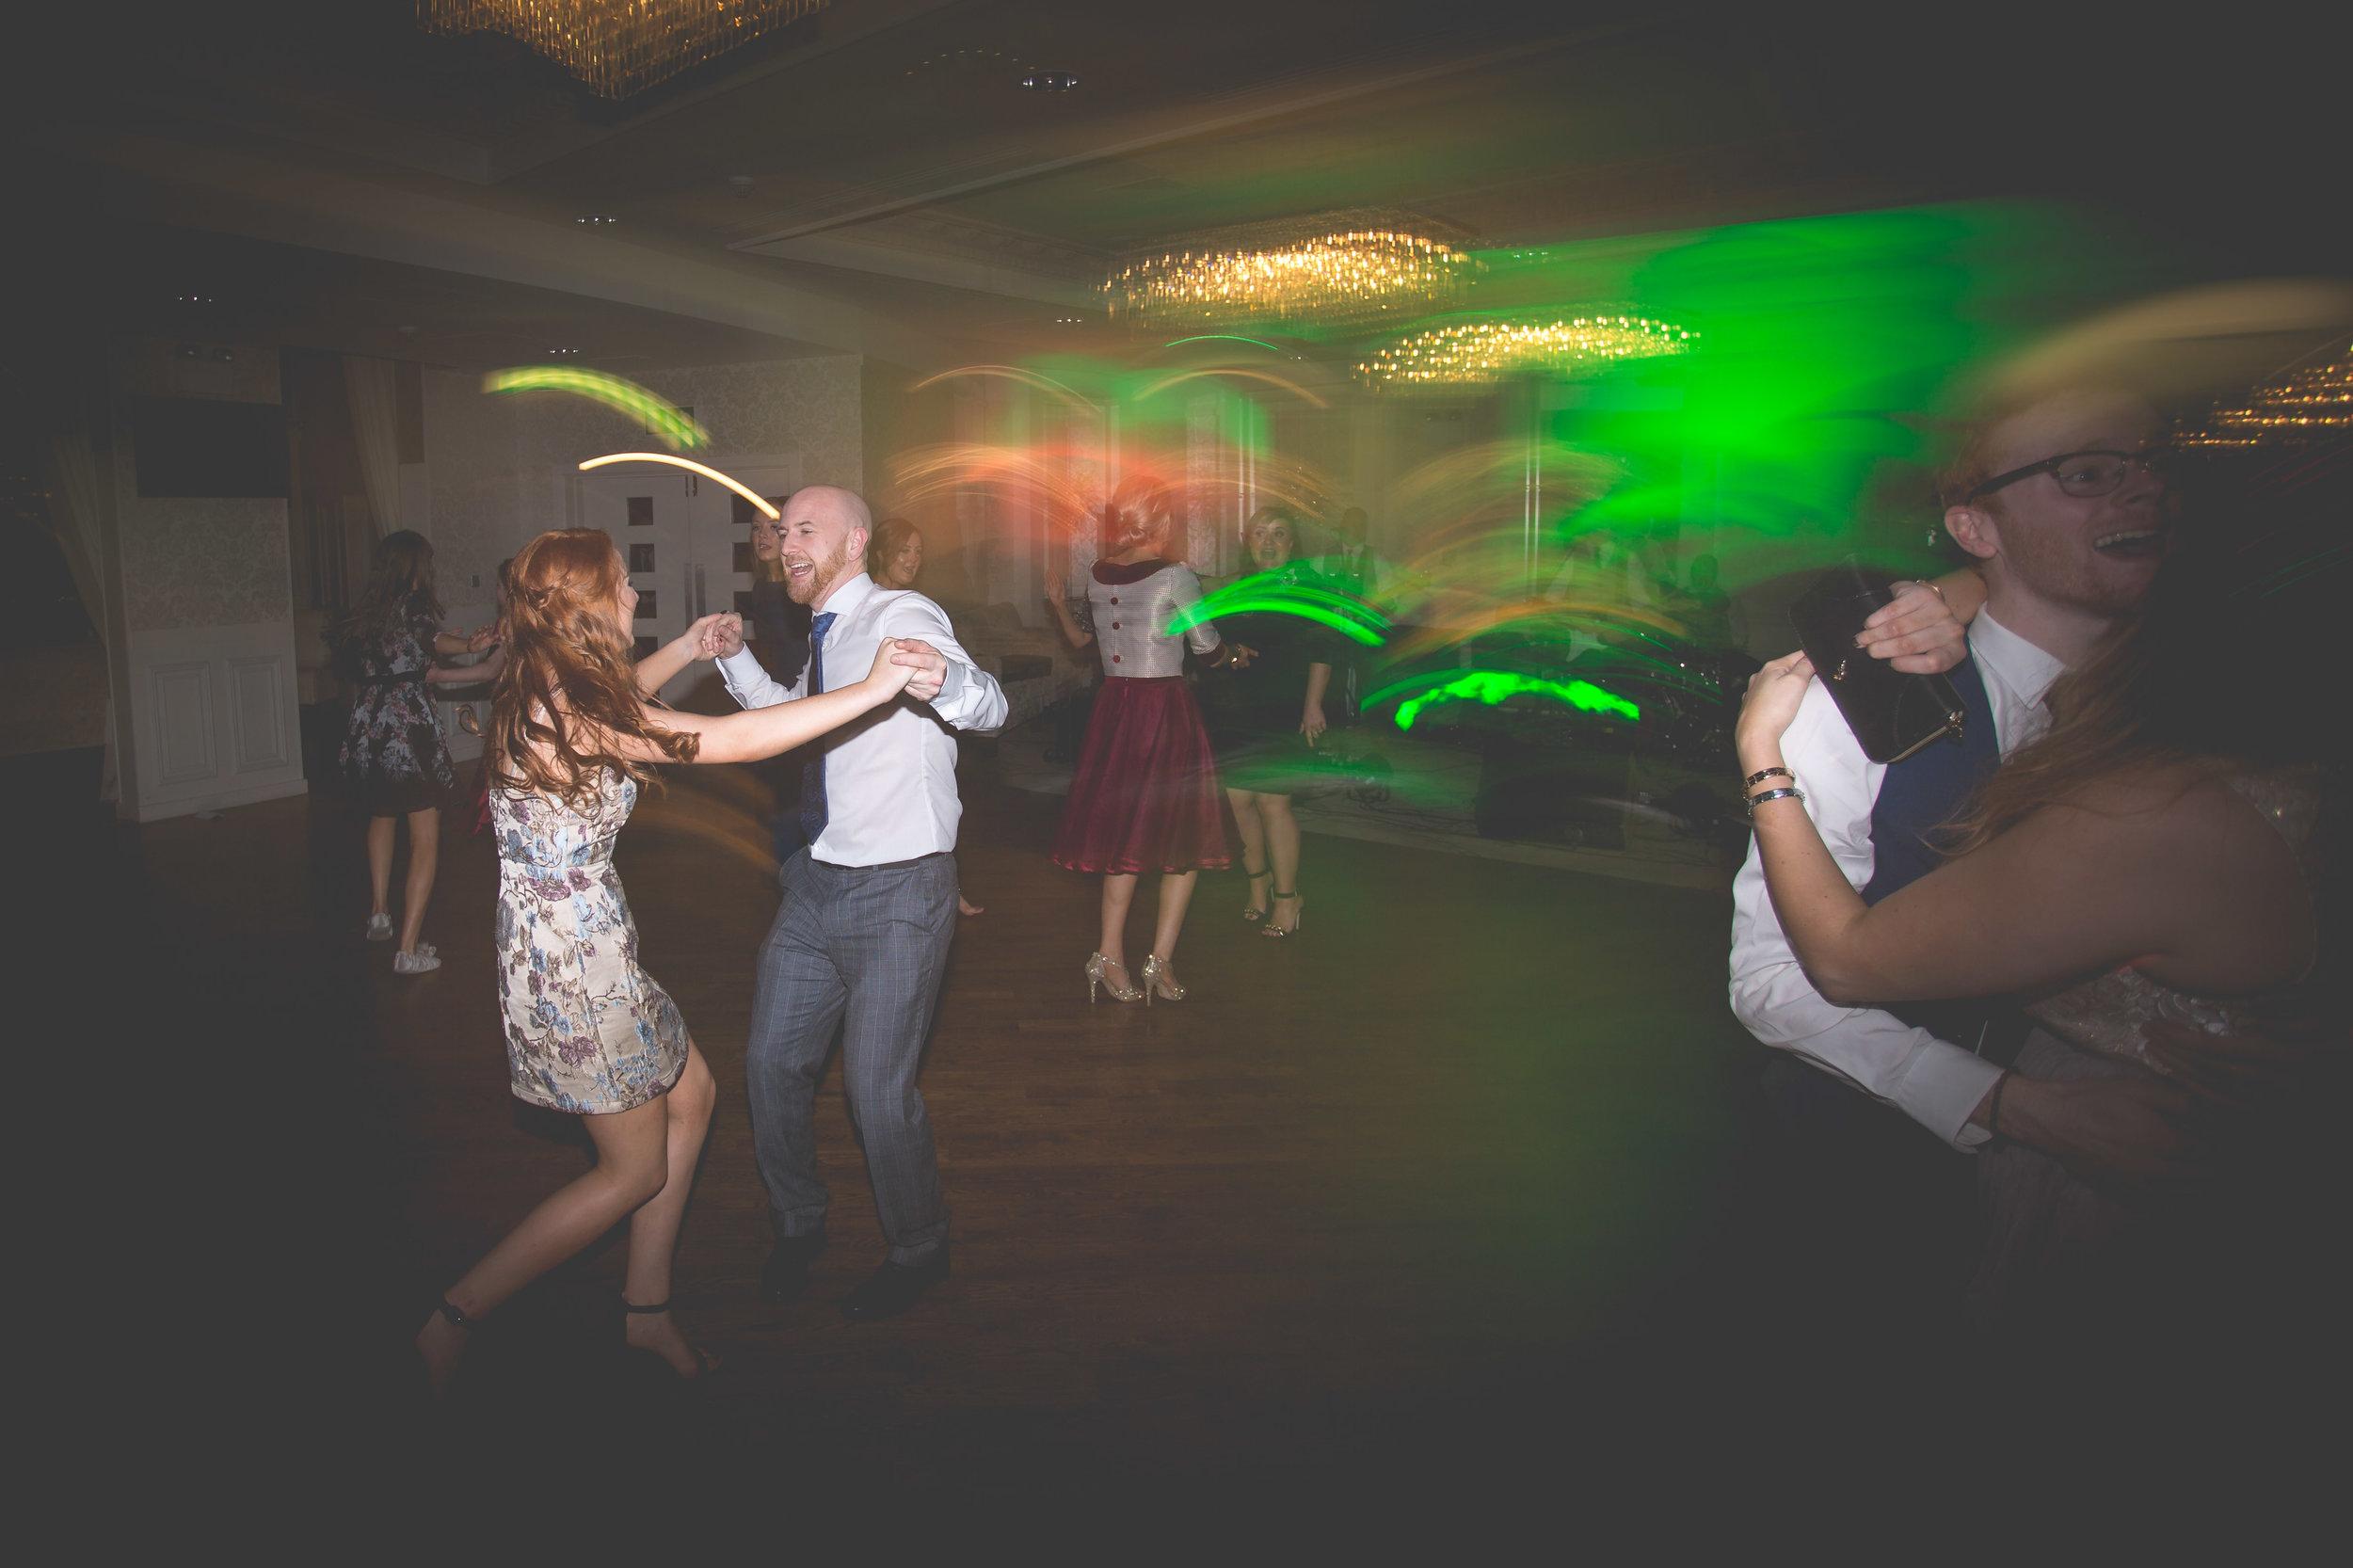 MaryJo_Conor_Mageean_Dancing-26.jpg